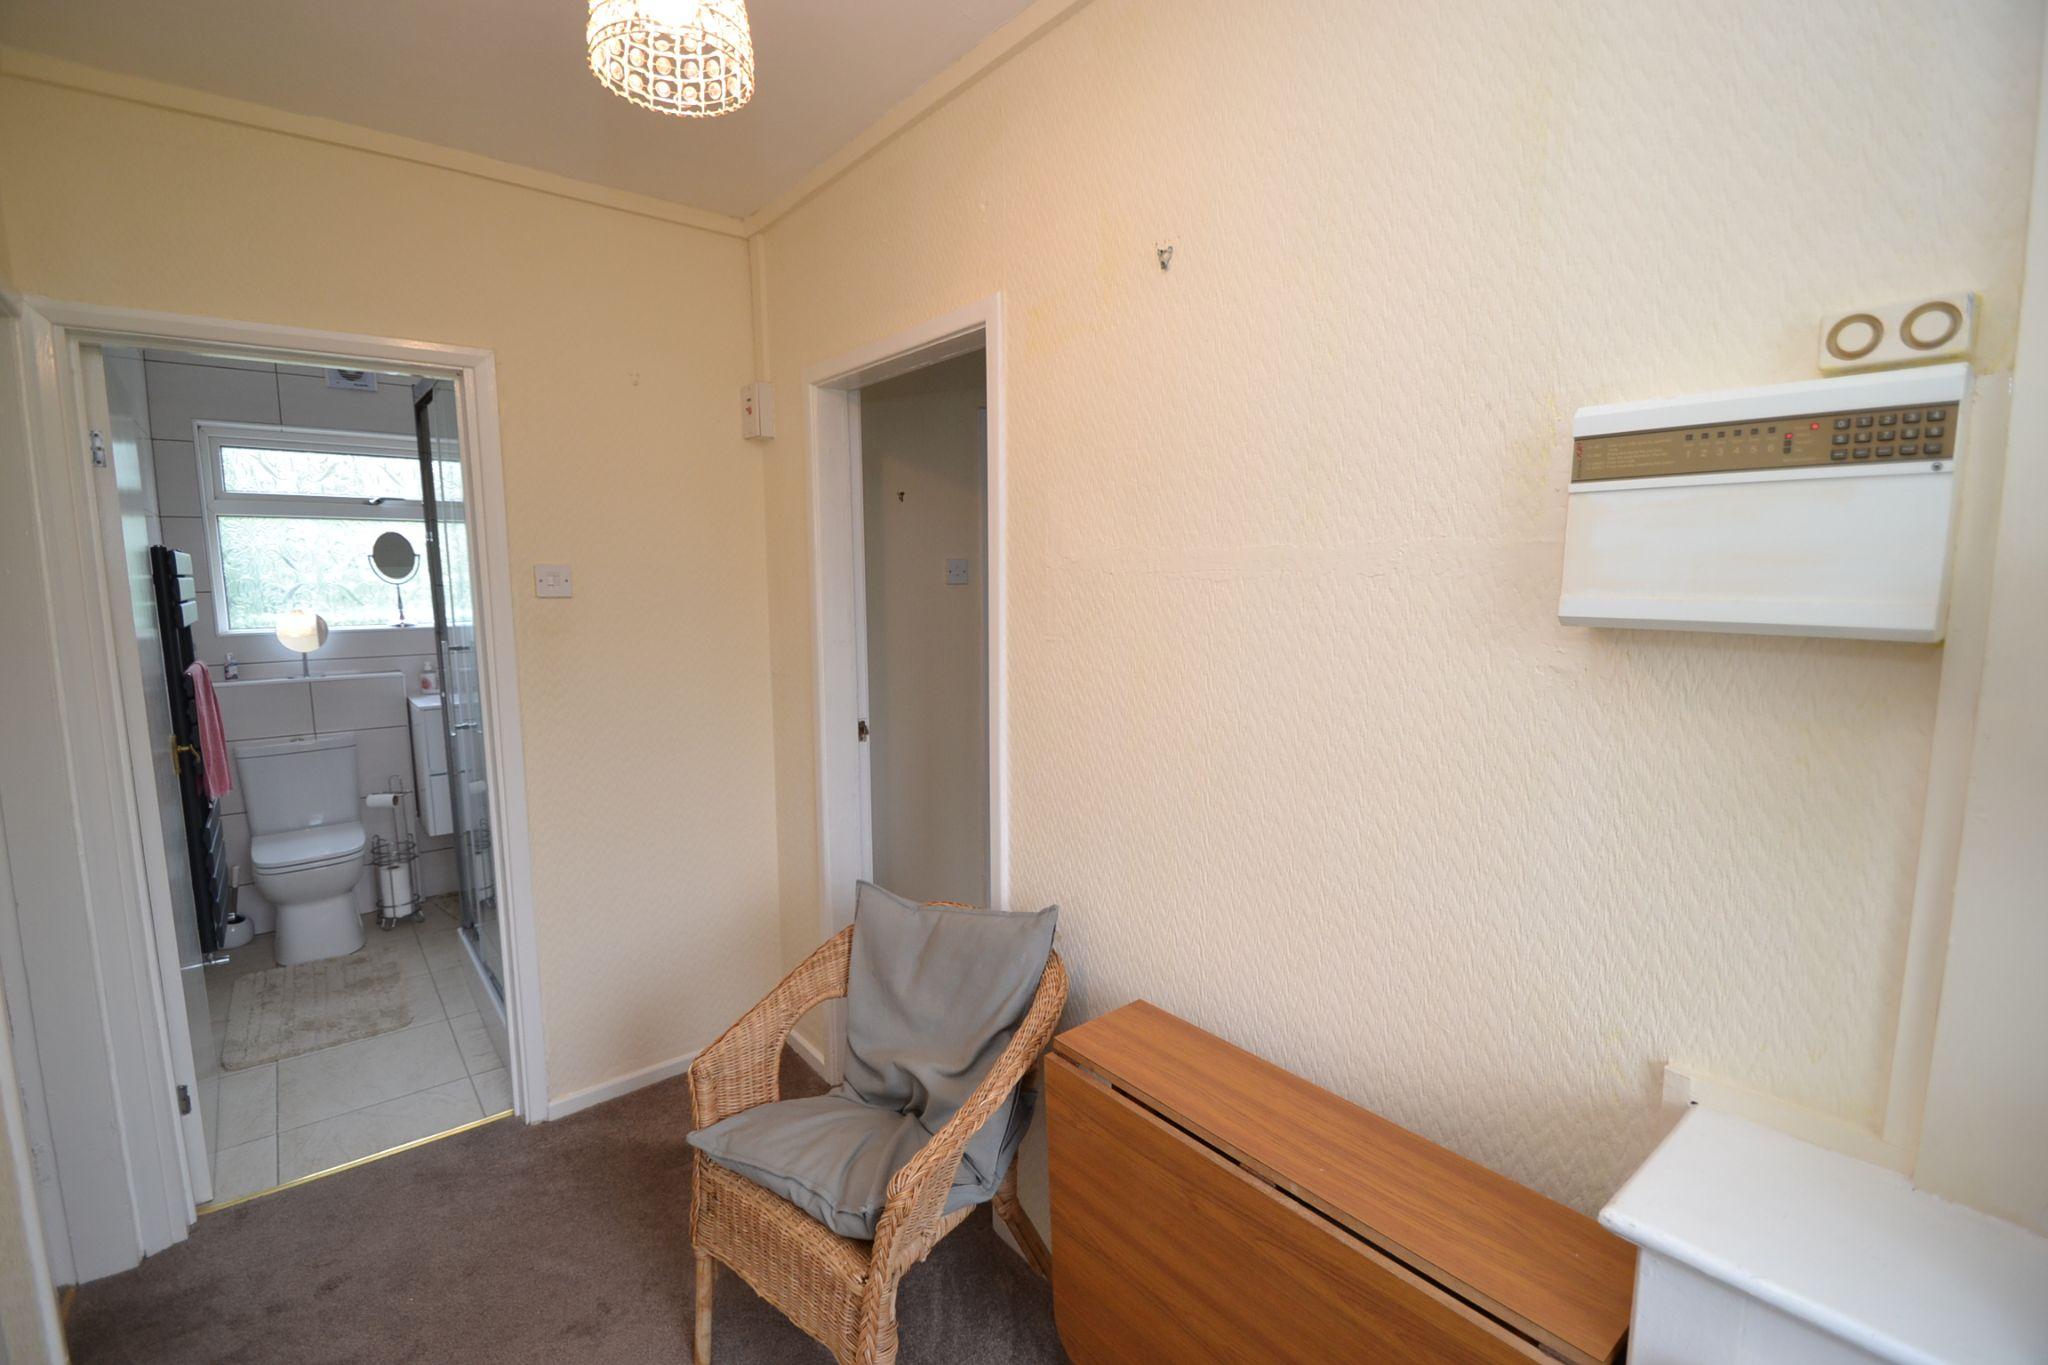 1 Bedroom Ground Floor Maisonette Flat/apartment For Sale - Photograph 7